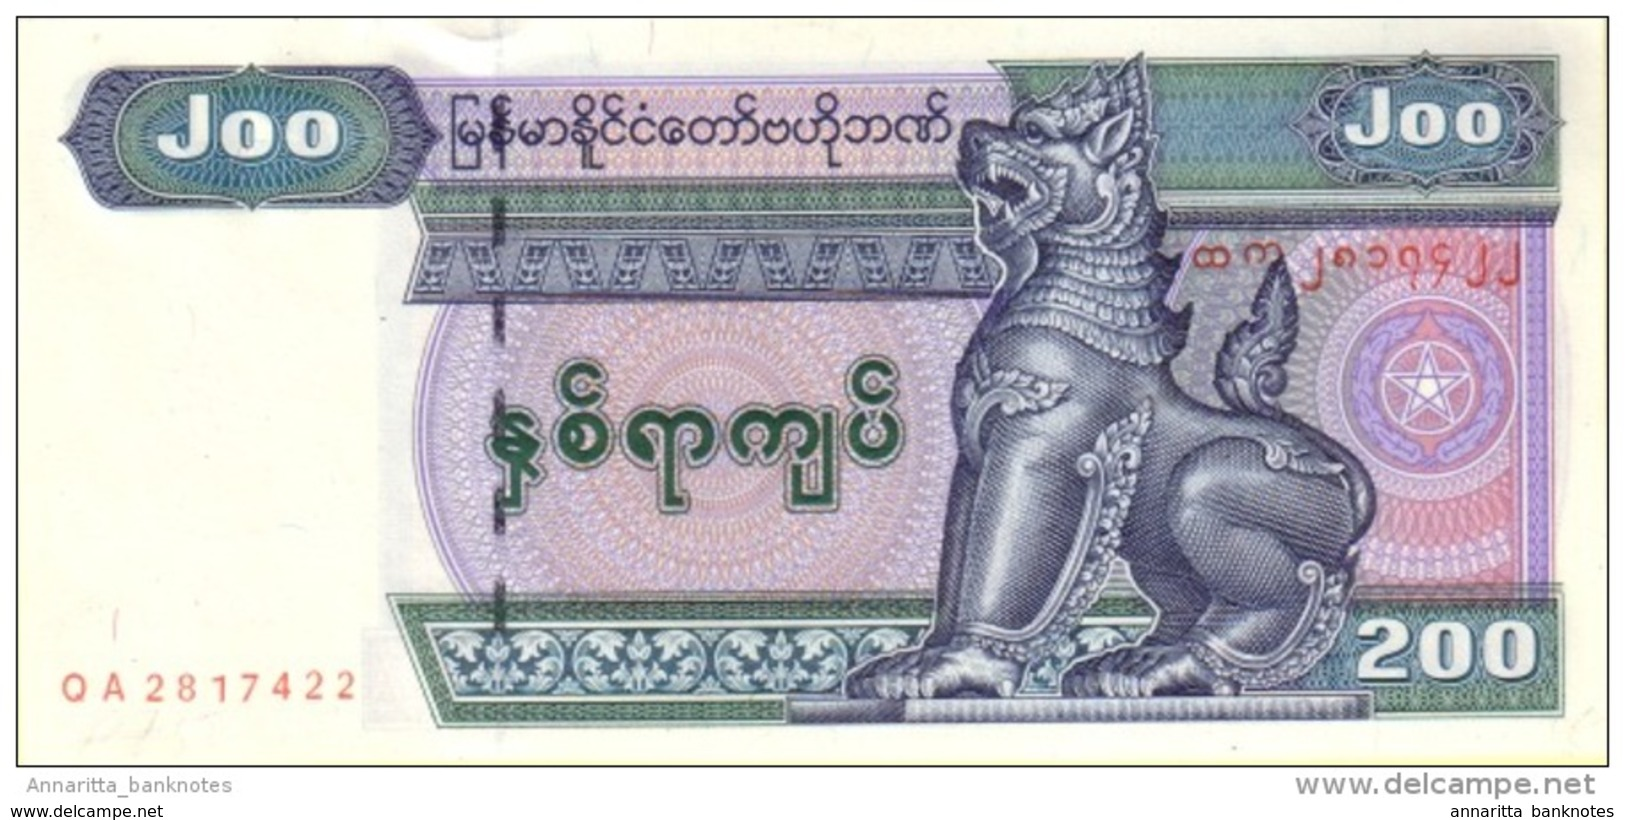 MYANMAR 200 KYATS ND (2004) P-78a UNC REDUCED SIZE [MM112a] - Myanmar